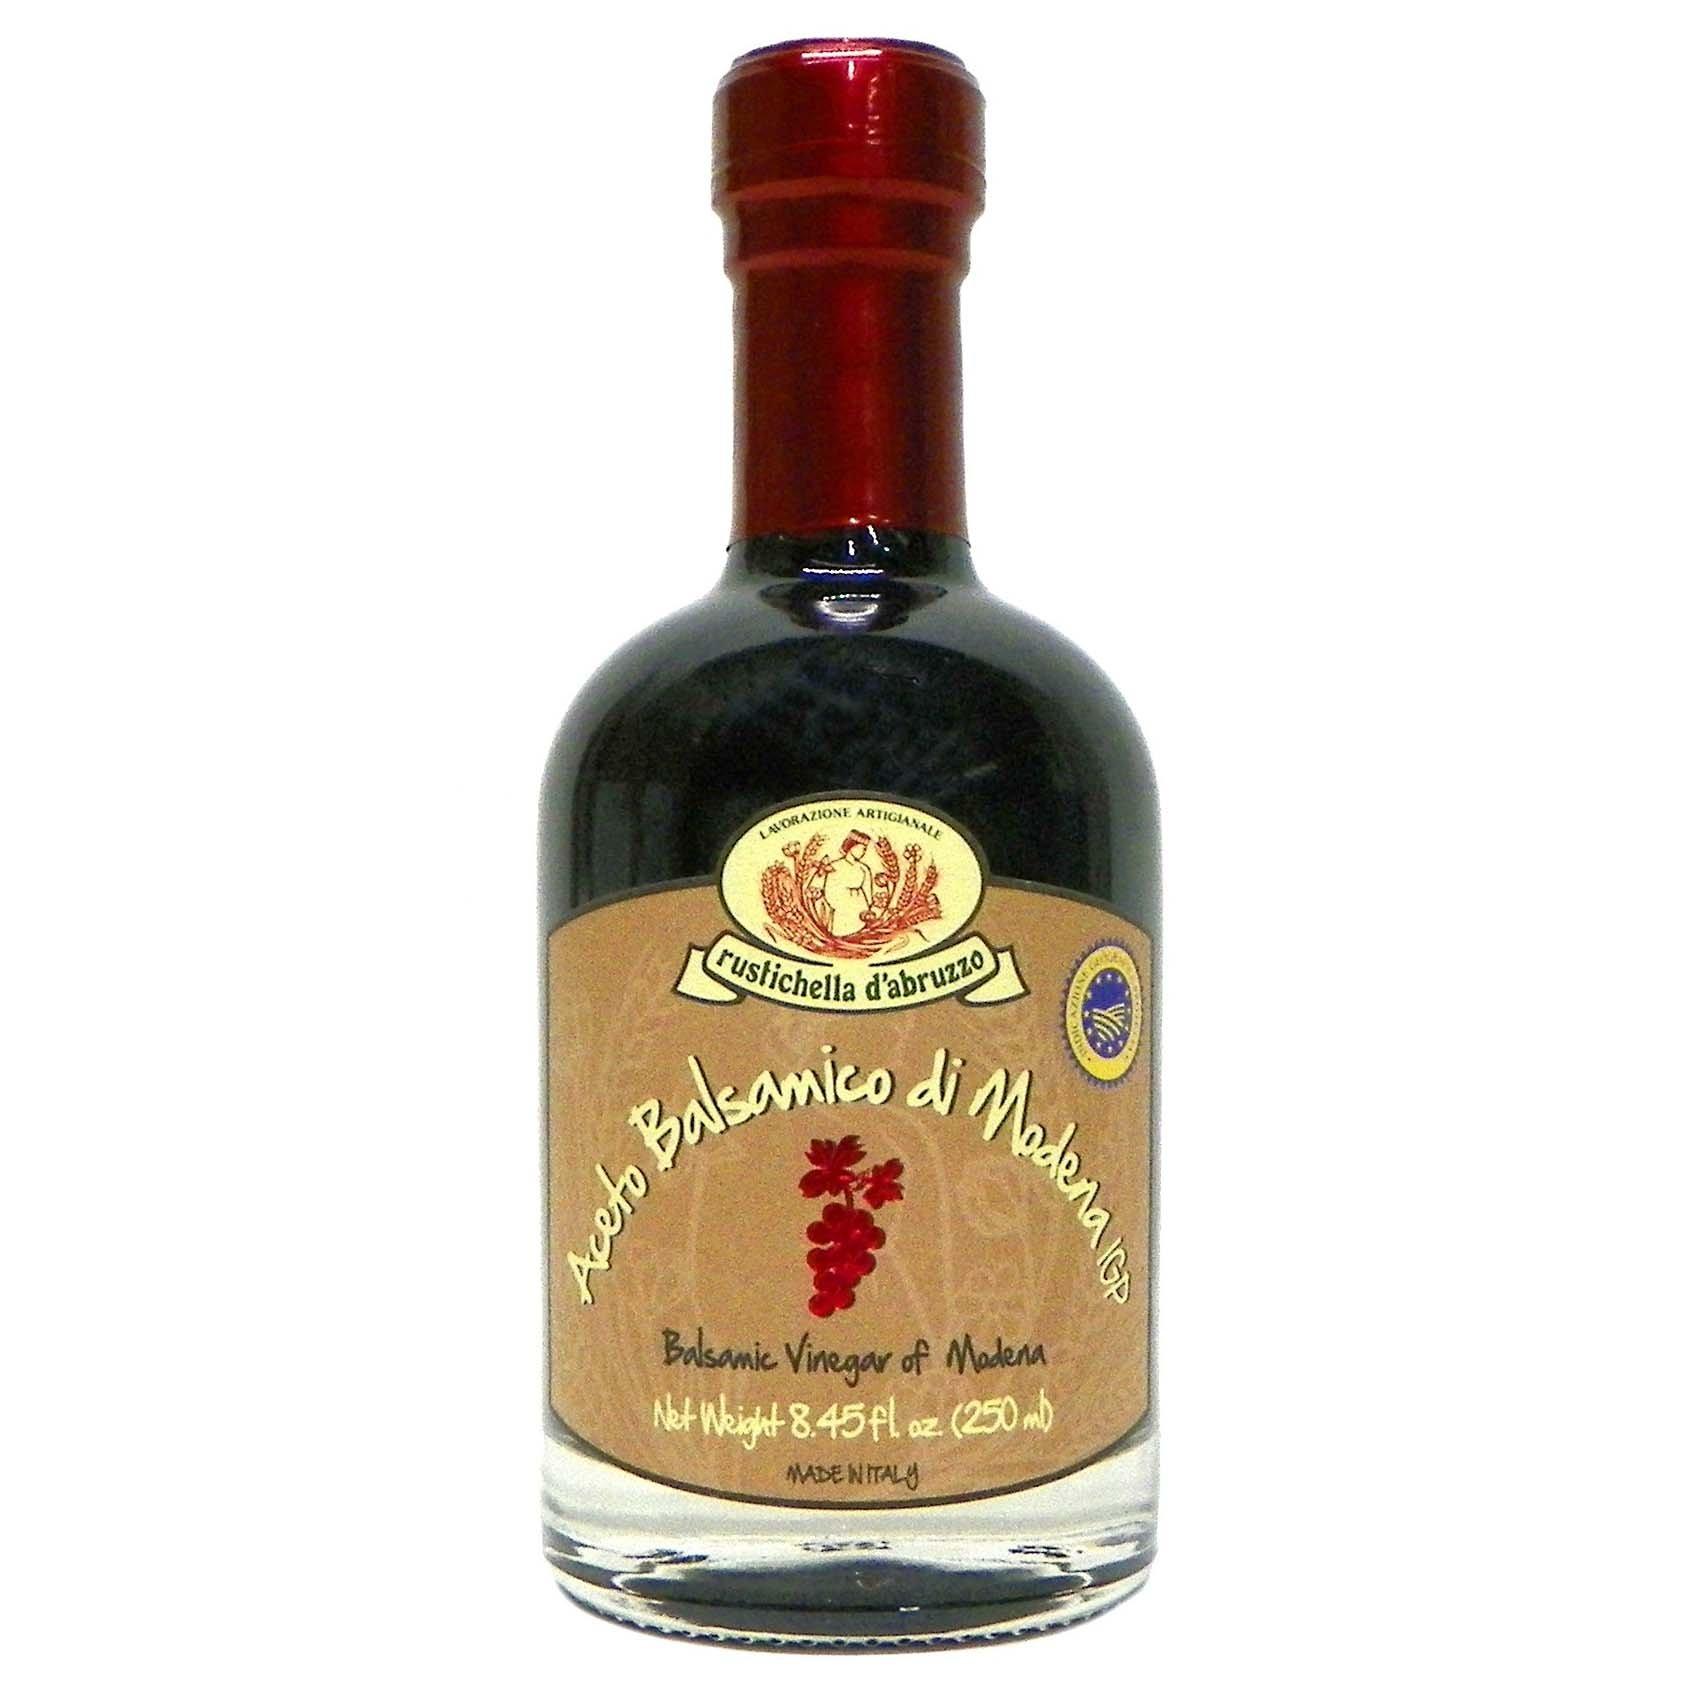 Rustichella  D'Abruzzo Balsamic Vinegar 6 Years Old, 8.4-Ounce